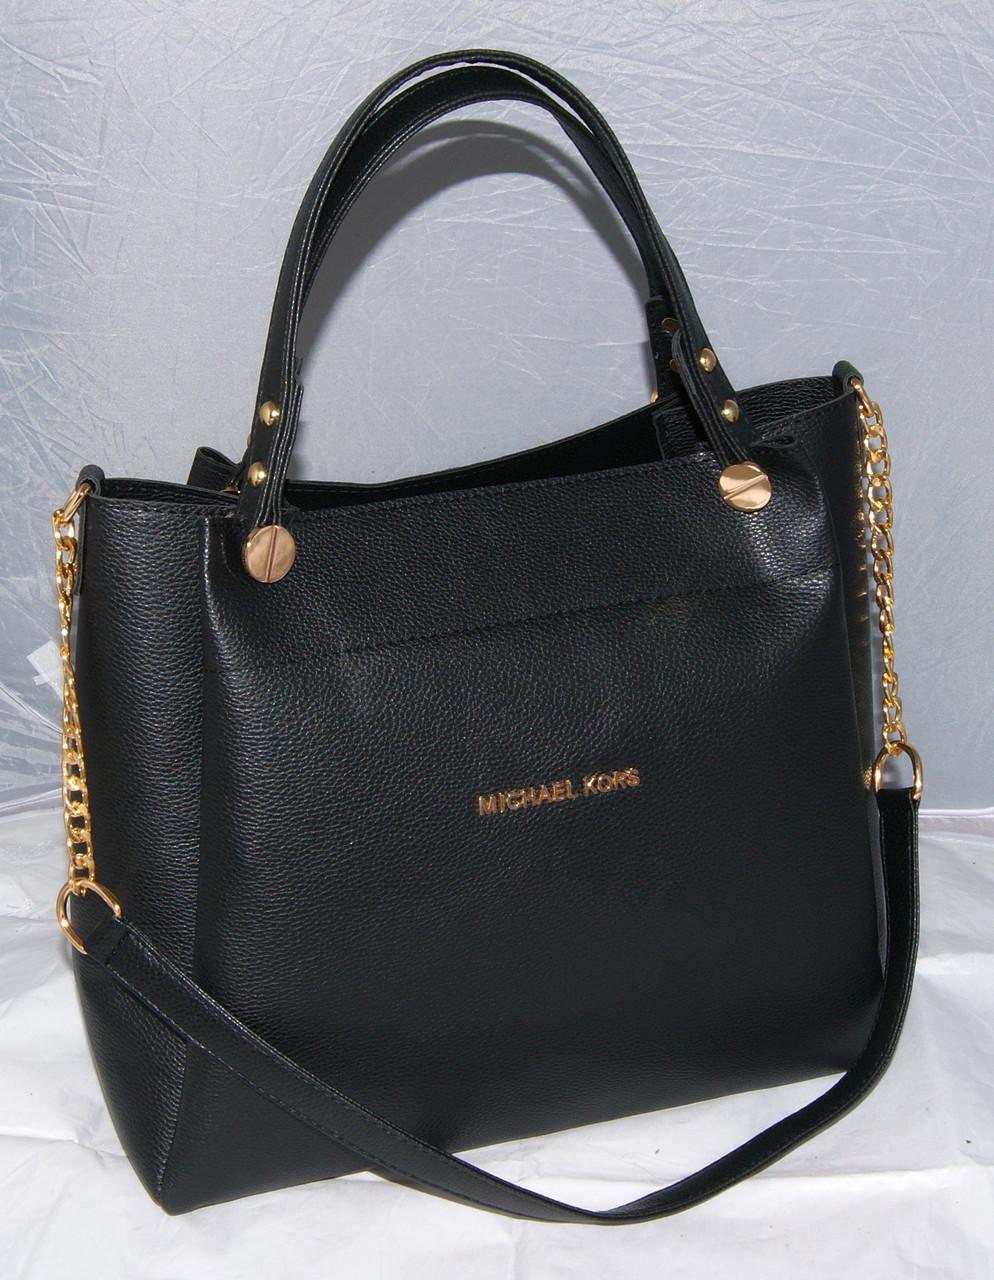 43b984728bea Женская сумка Michael Kors, цвет черный Майкл Корс MK  продажа, цена ...